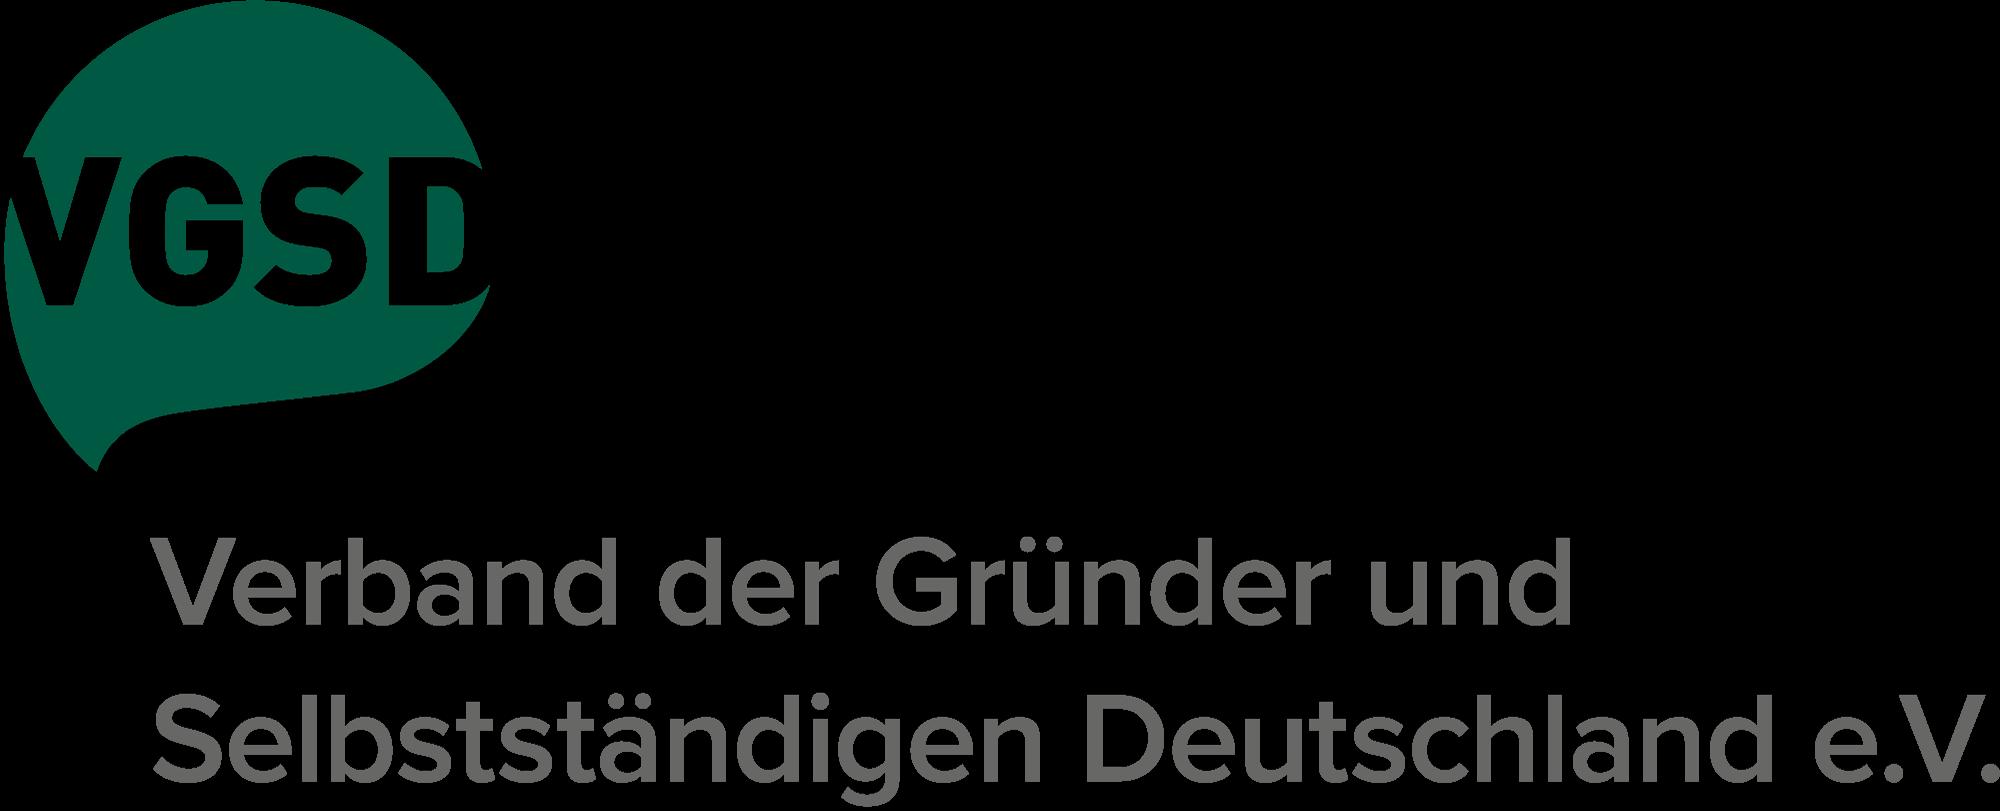 05_VGSD Logo